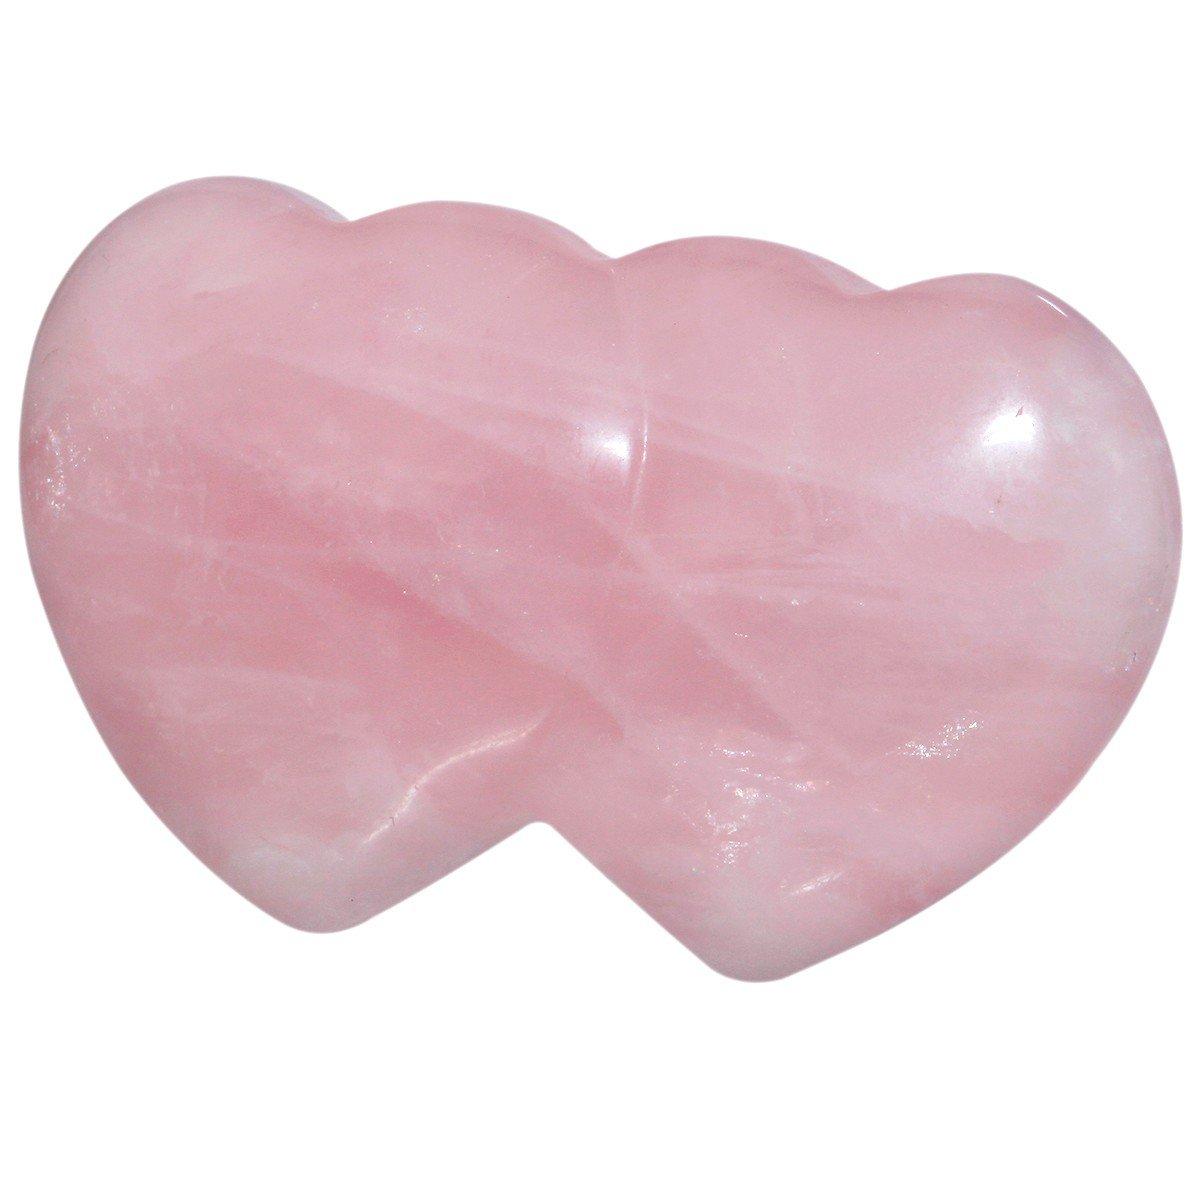 mookaitedecor Healing Crystals Rose Quartz Double